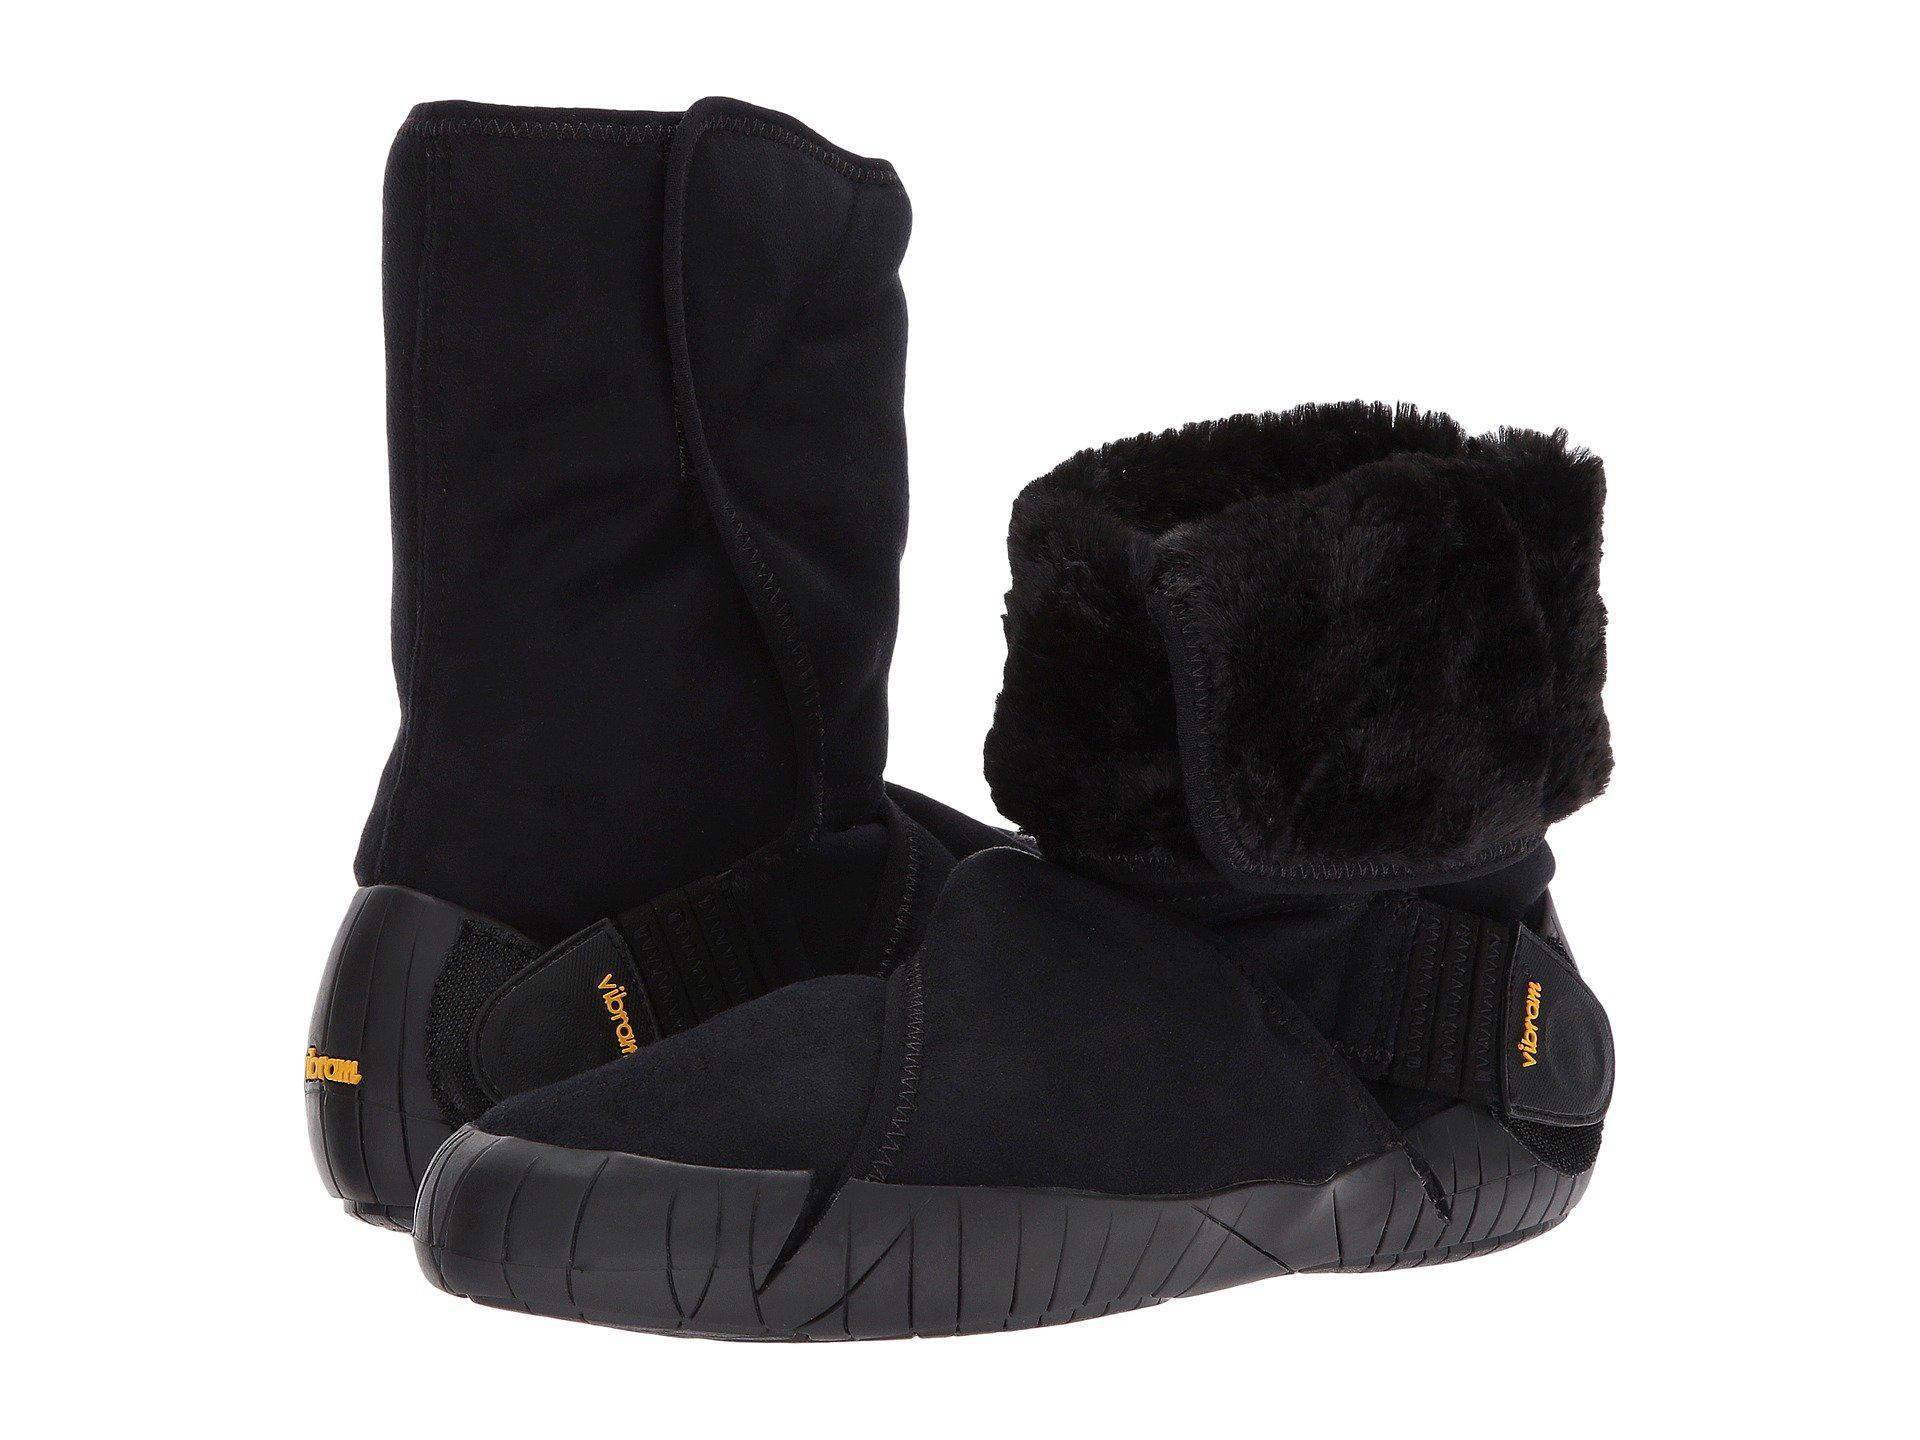 hot sale online 182a8 b4f64 vibram-fivefingers-Black-Furoshiki-Eastern-Traveler-Mid-black-Womens-Shoes .jpeg